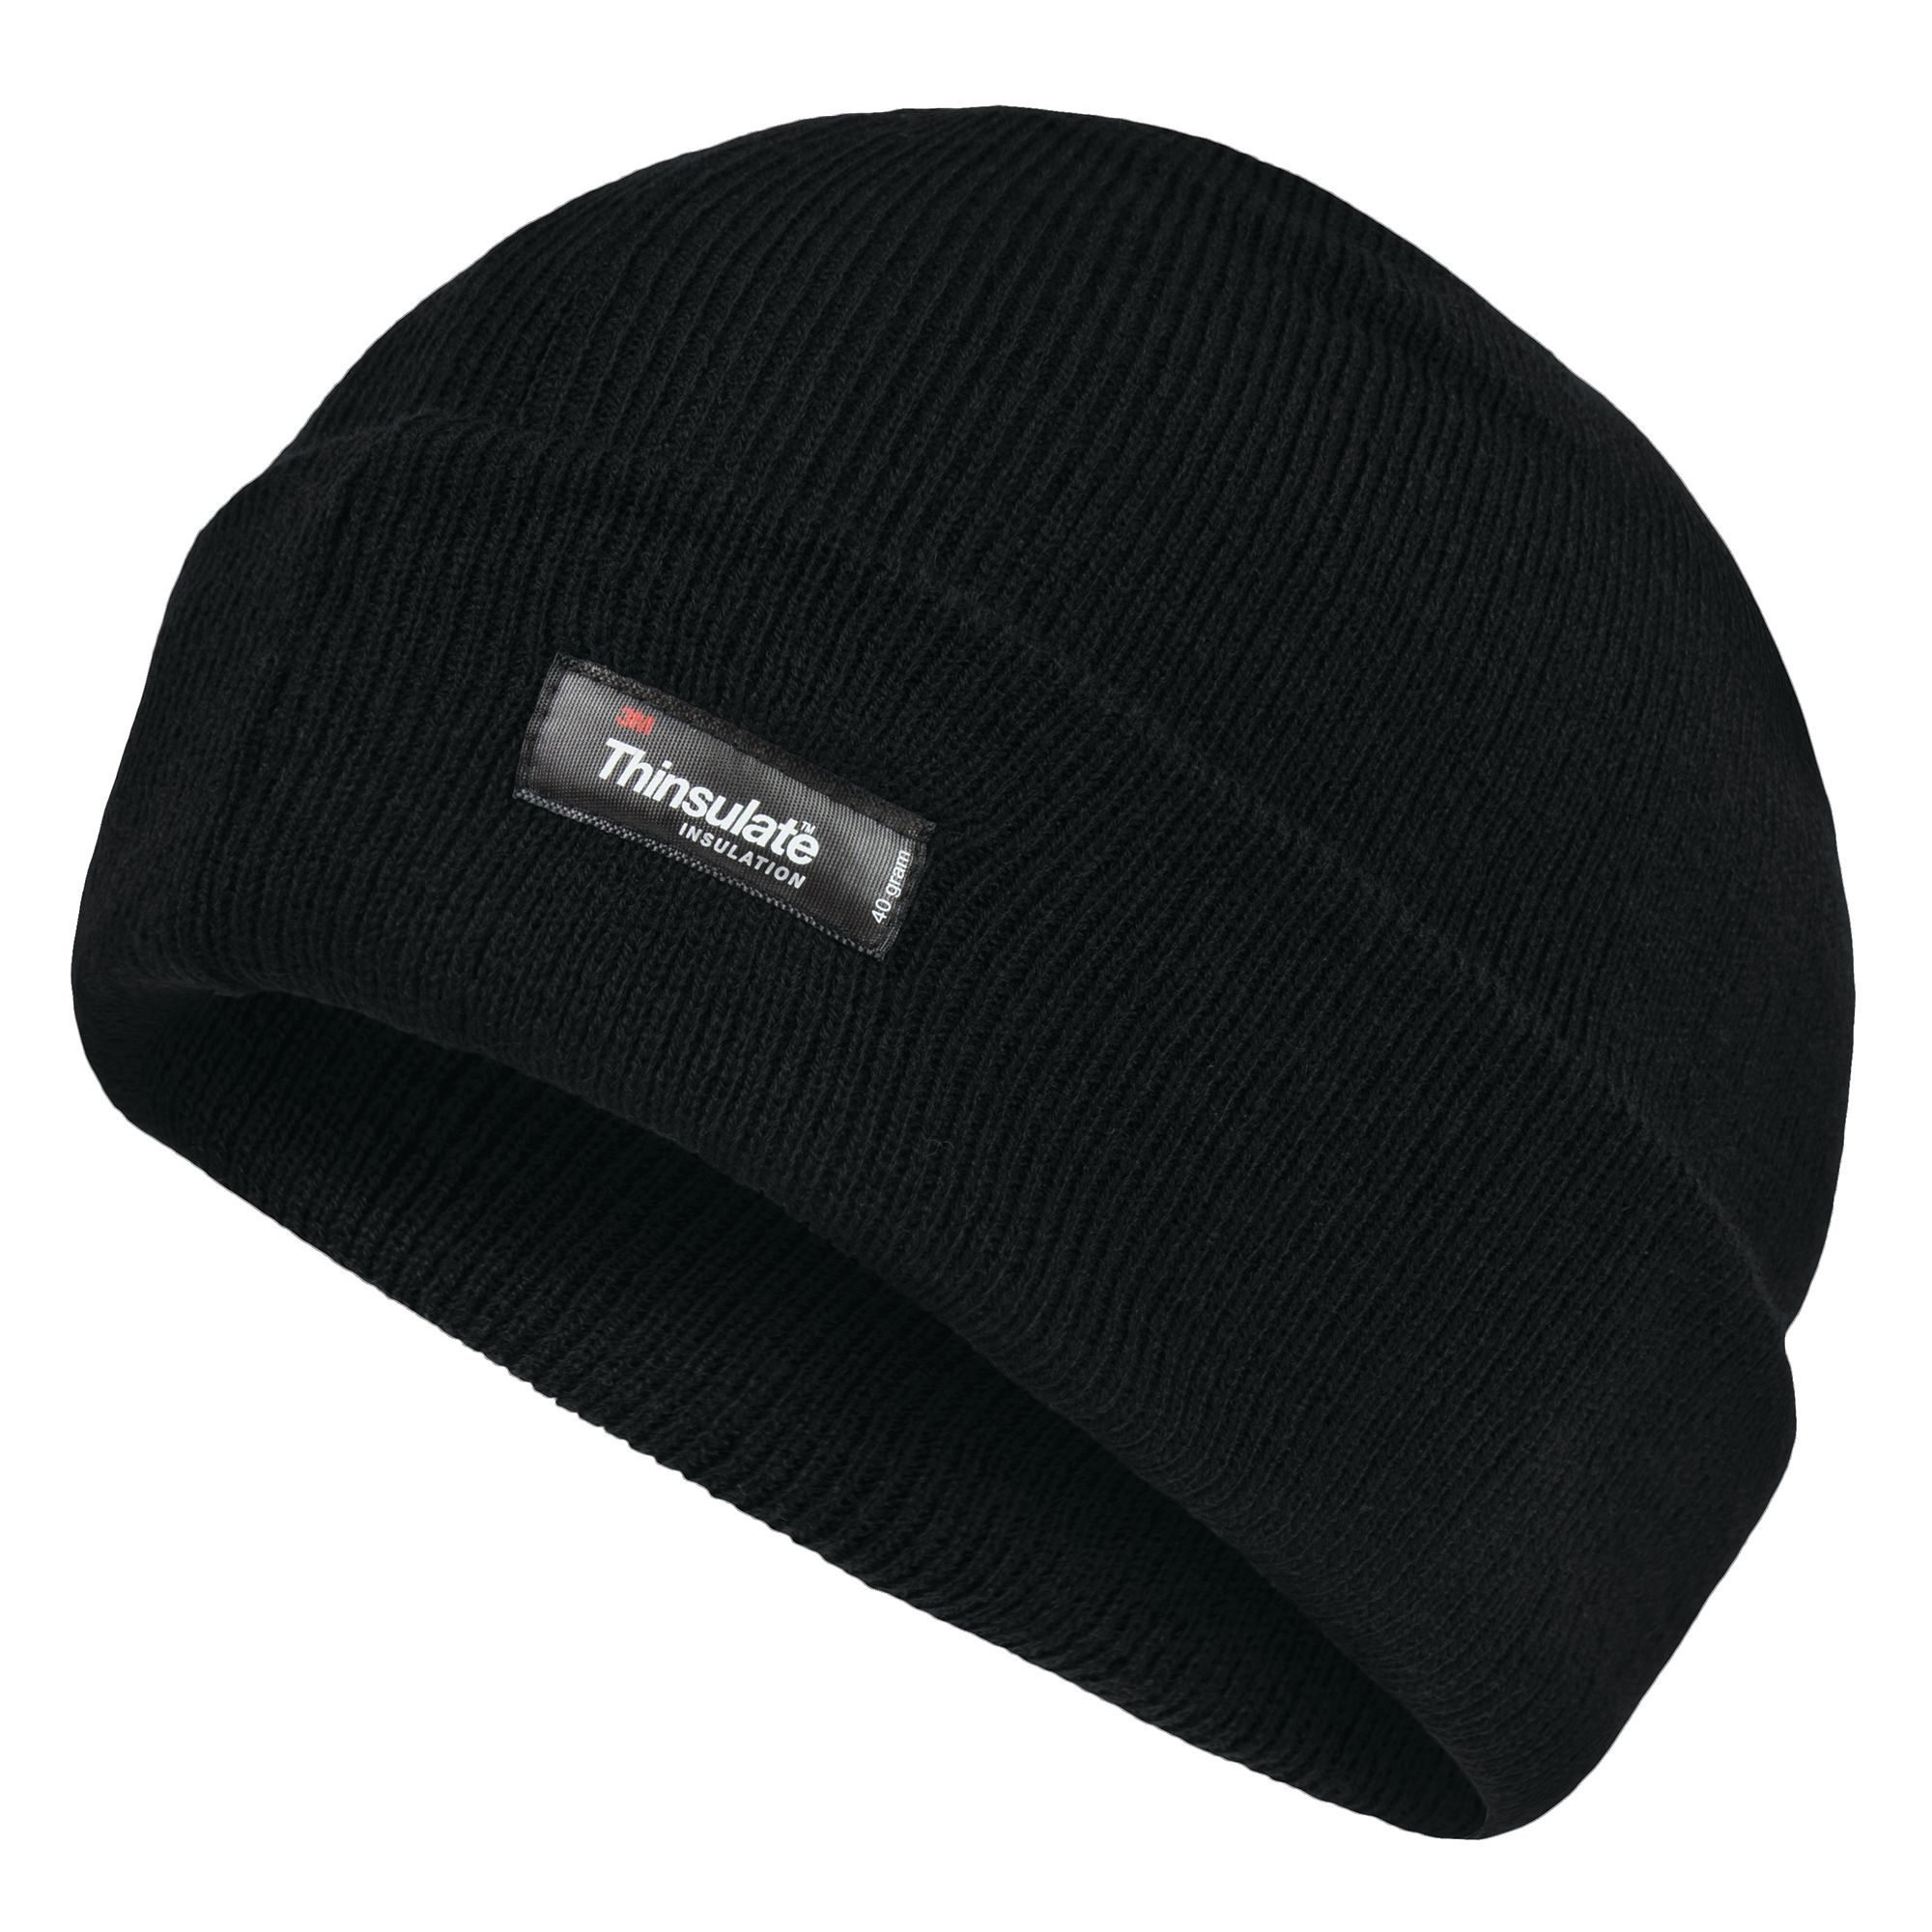 Regatta-Bonnet-Homme